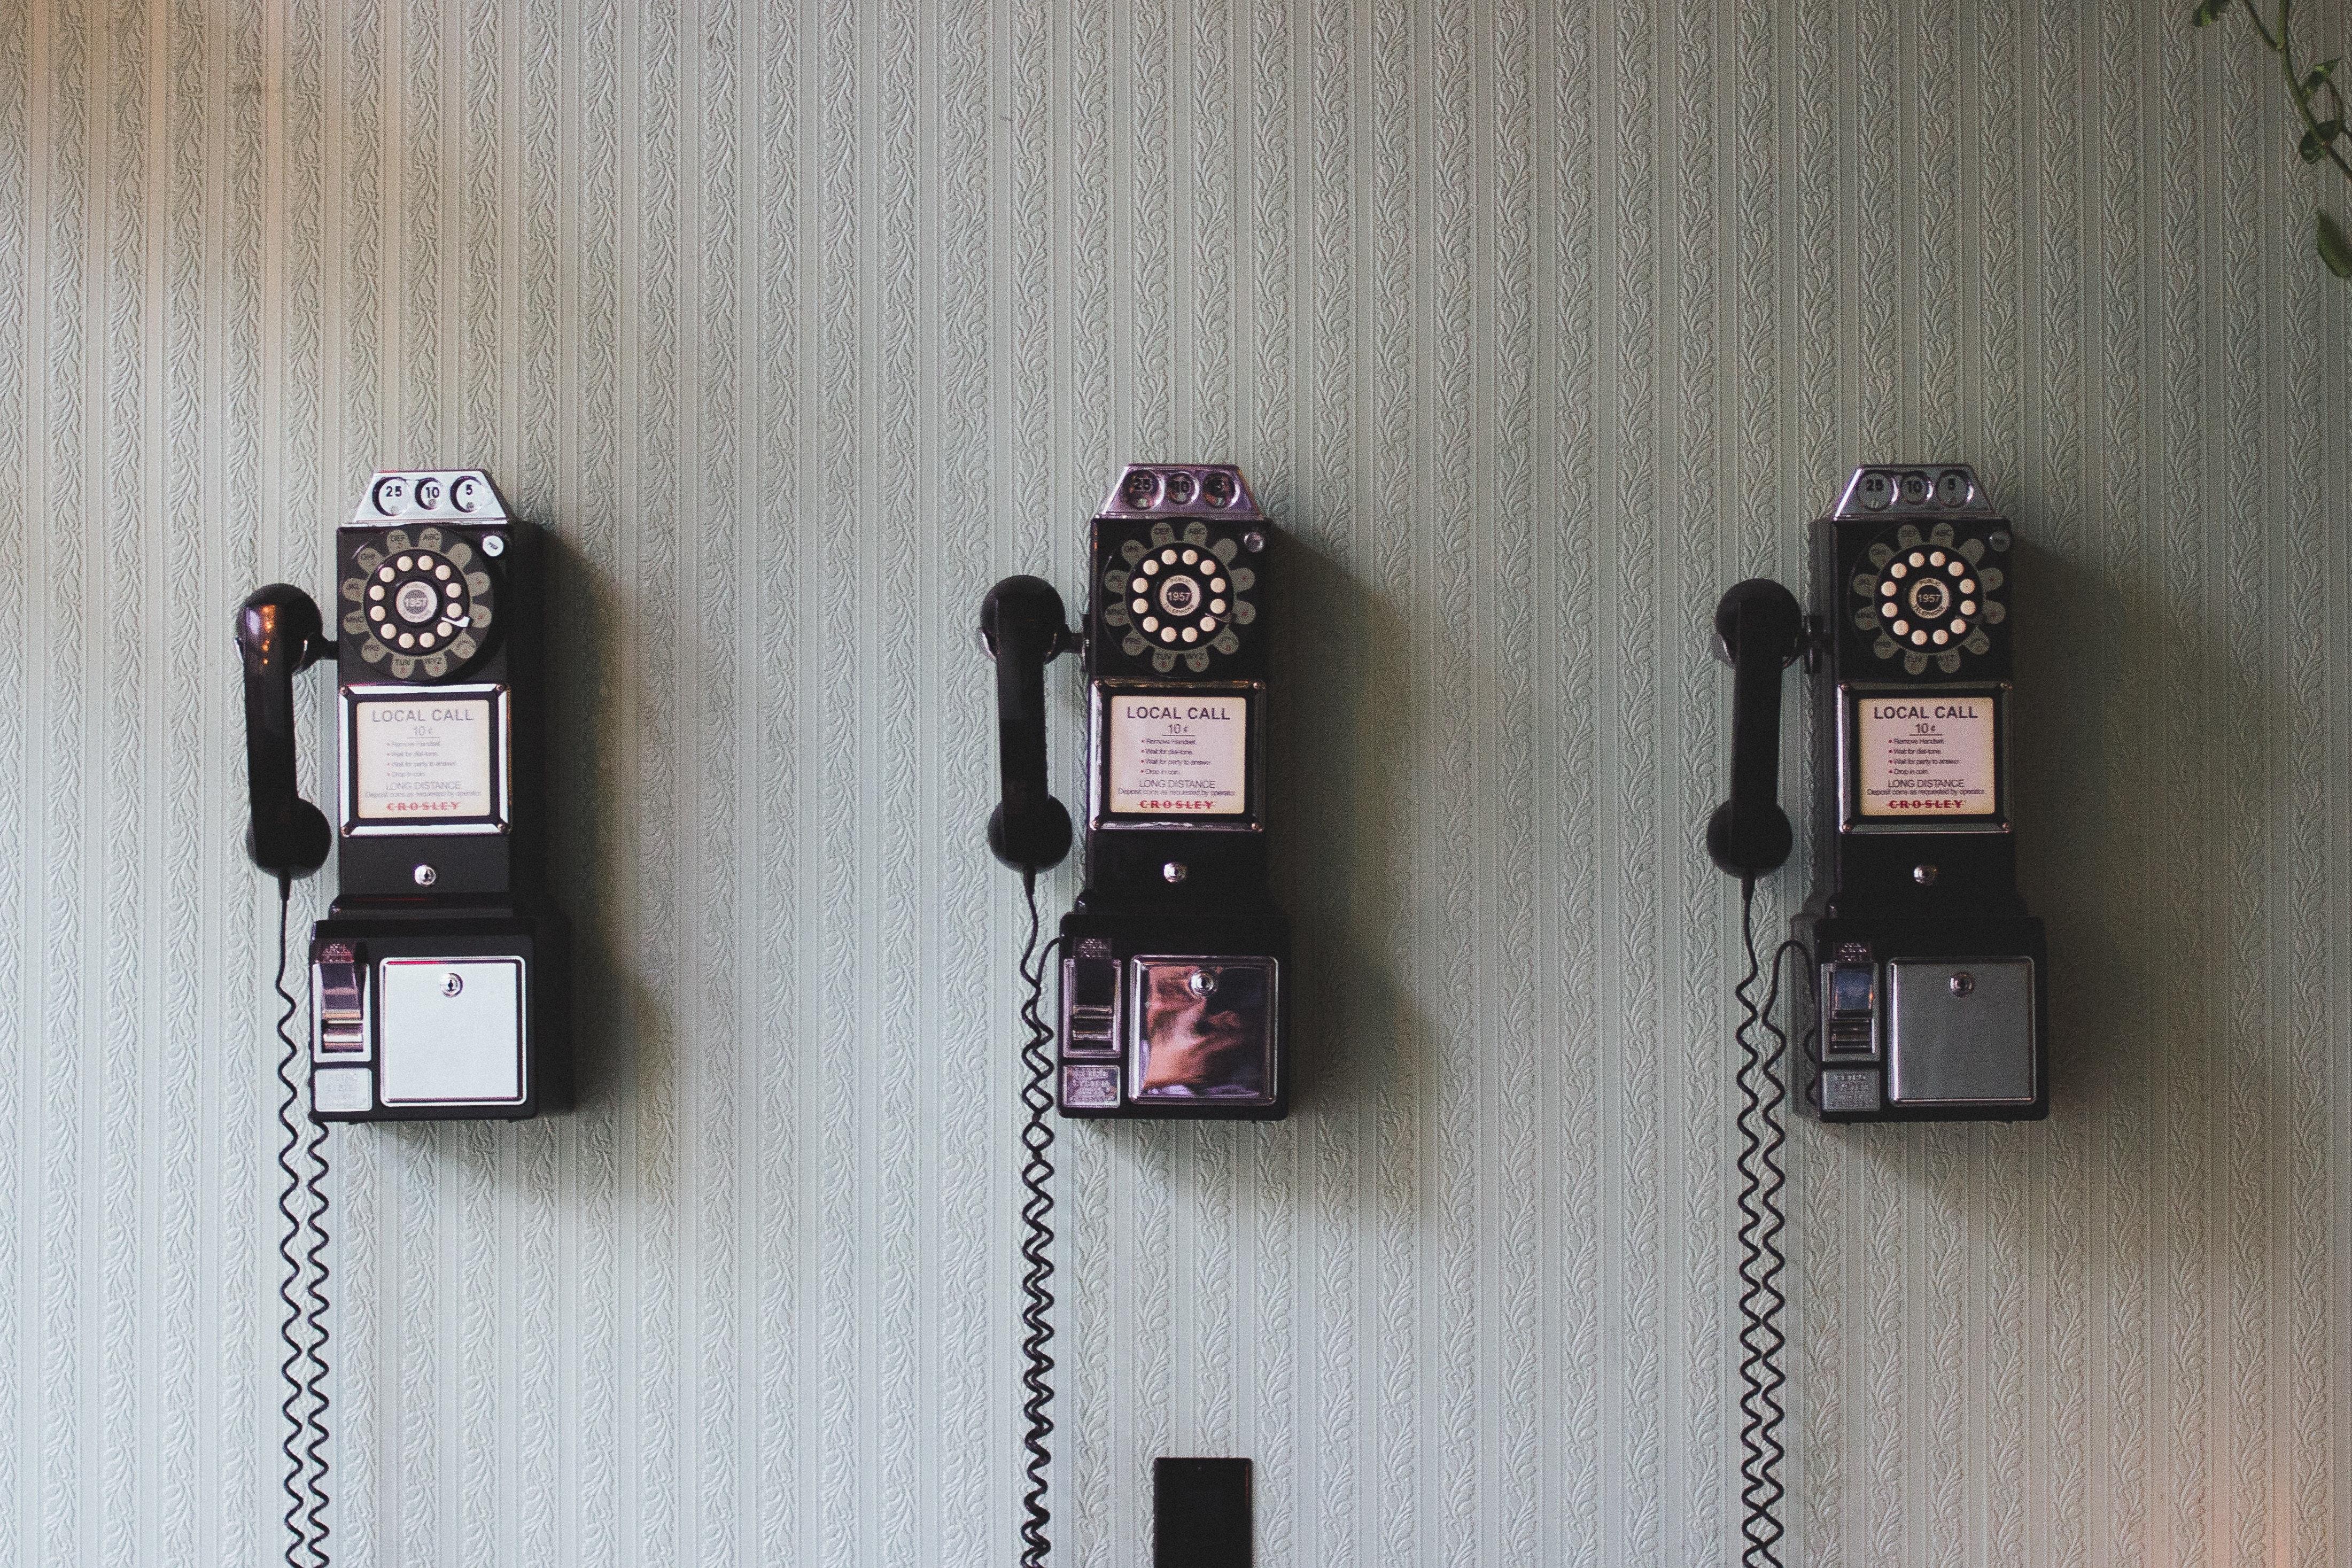 Anruf Telefon Symbolbild Professur Ruf erhalten